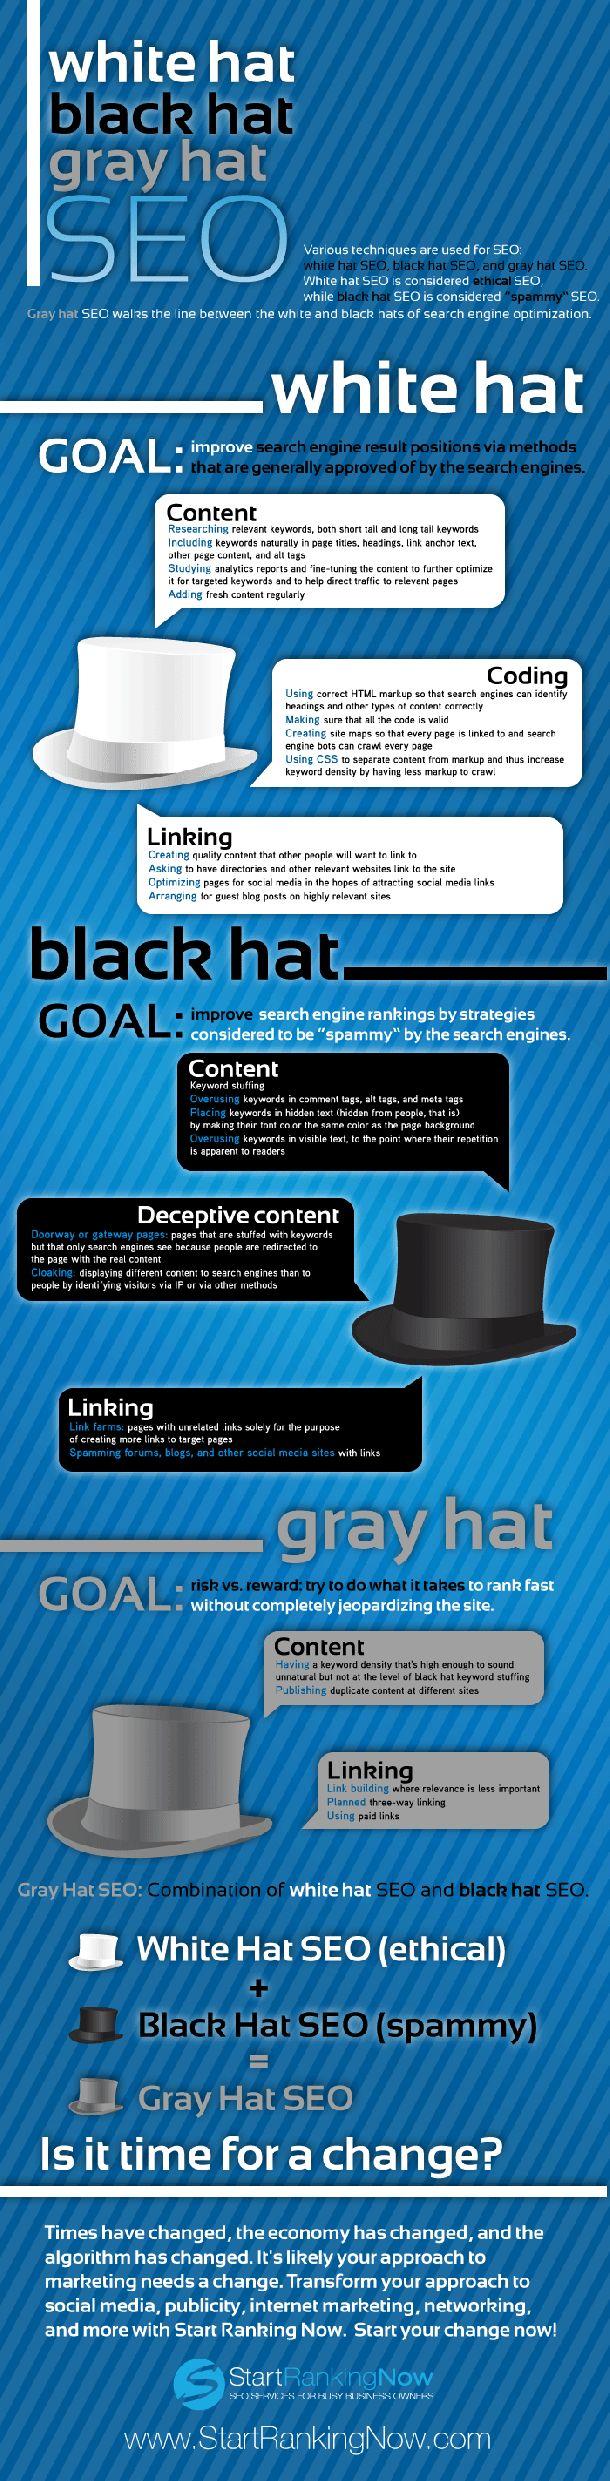 Black hat ppc gambling gambling magazine.com